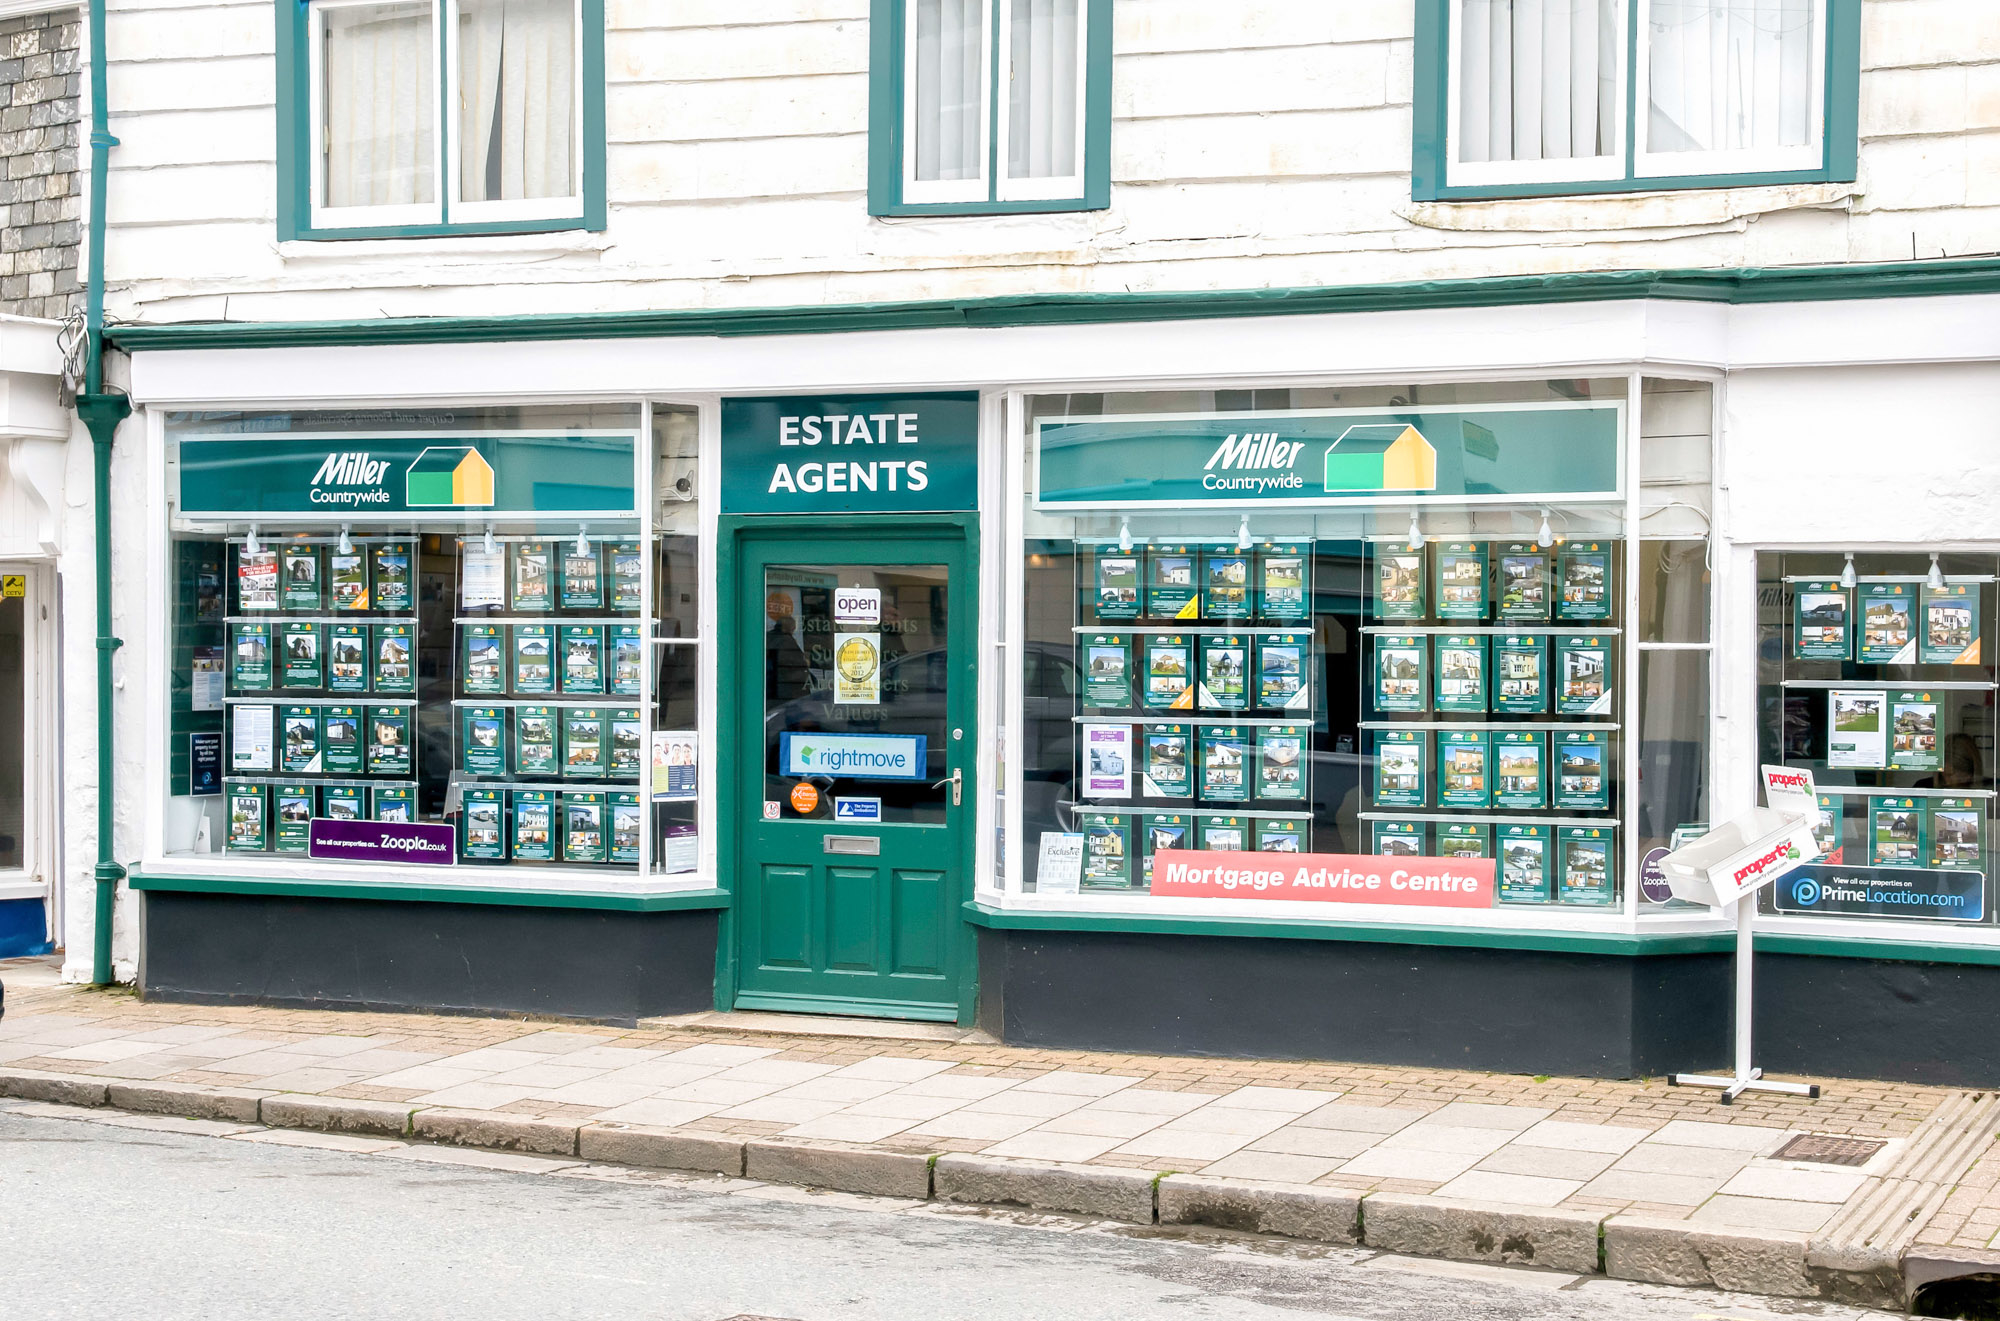 Miller Countrywide Estate Agents Callington - CLOSED